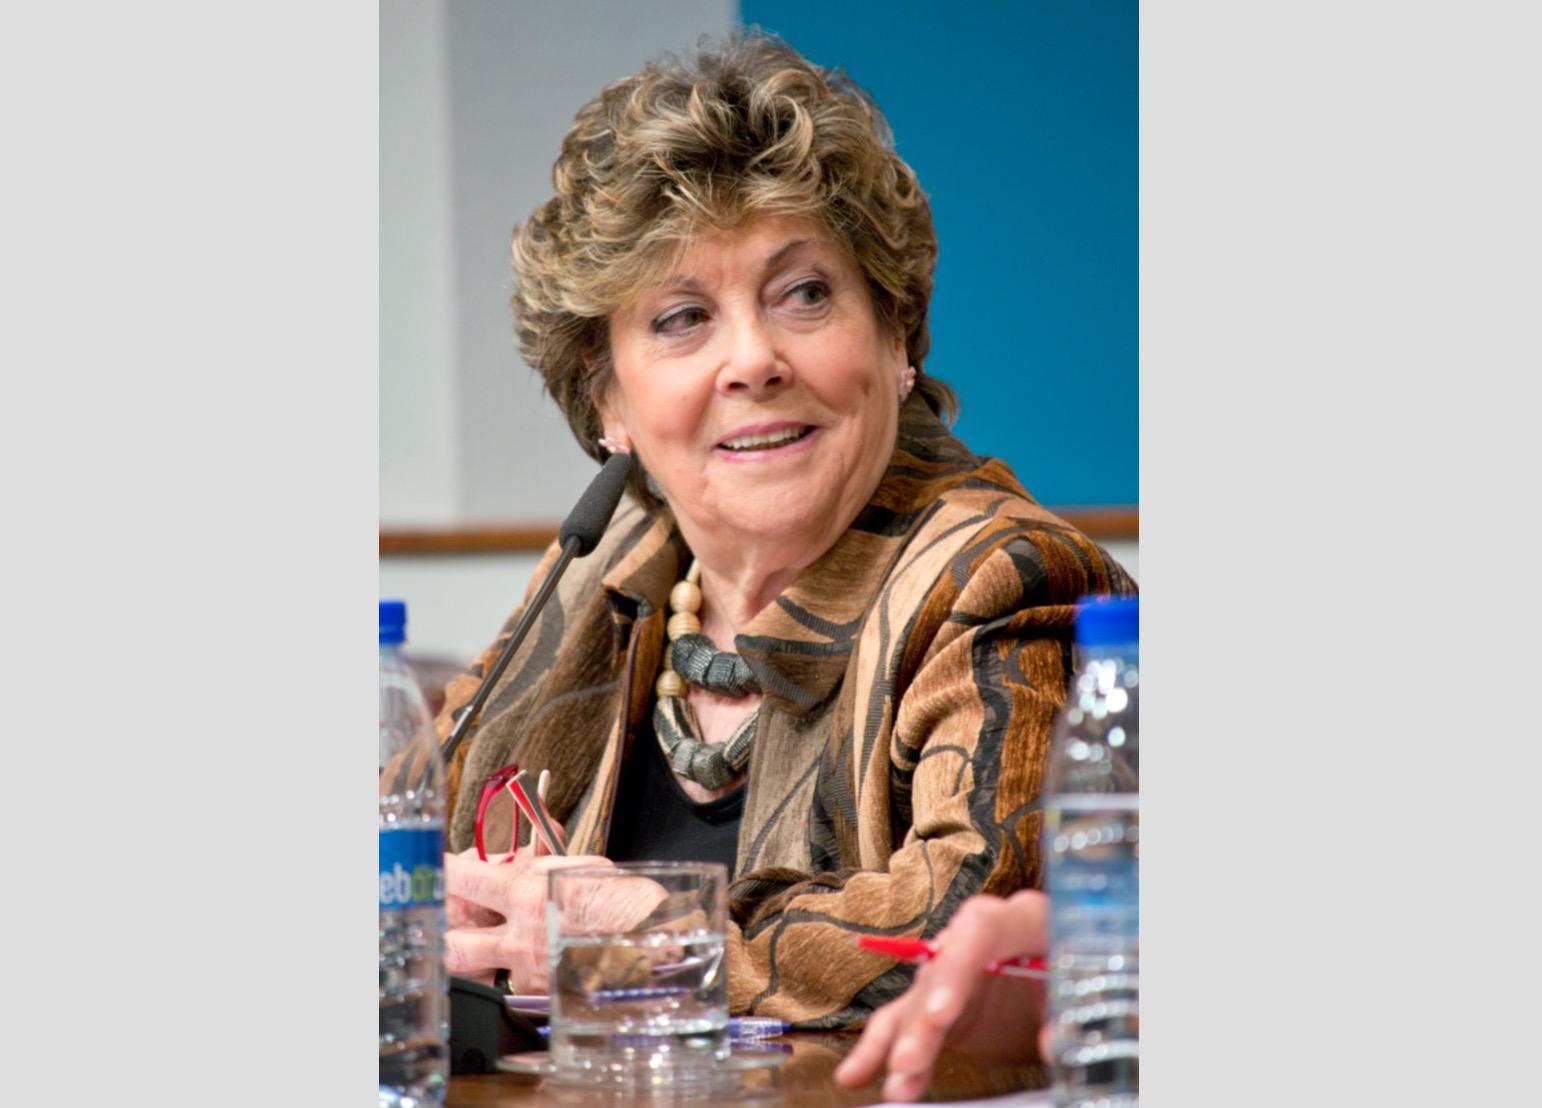 Paloma Gómez Borrero (Wiki Commons)